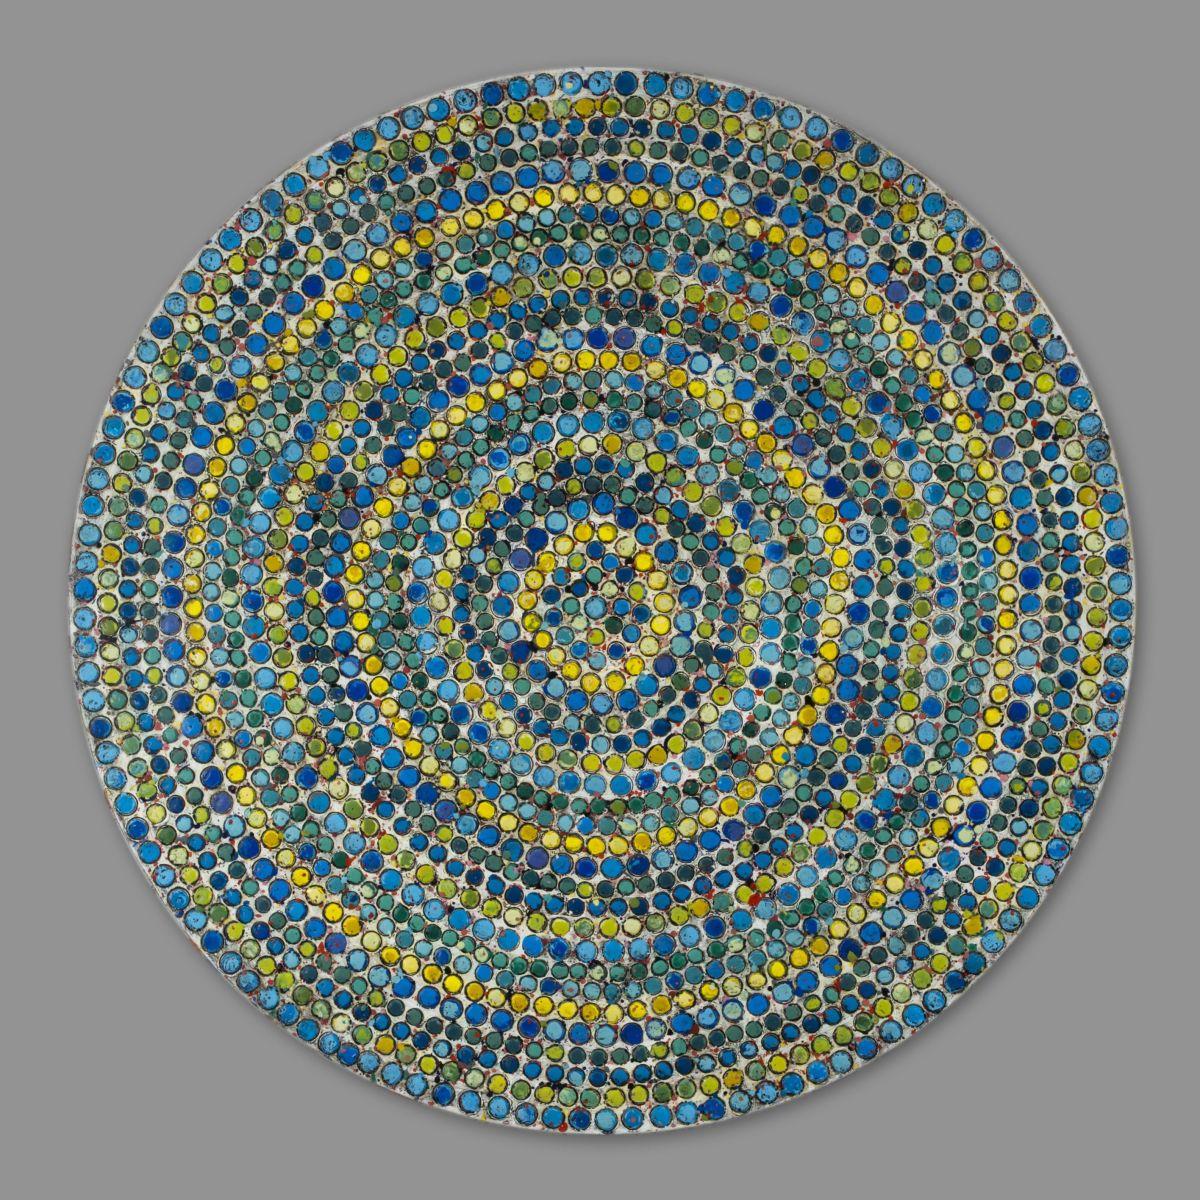 Brad Ellis artwork The Rounder